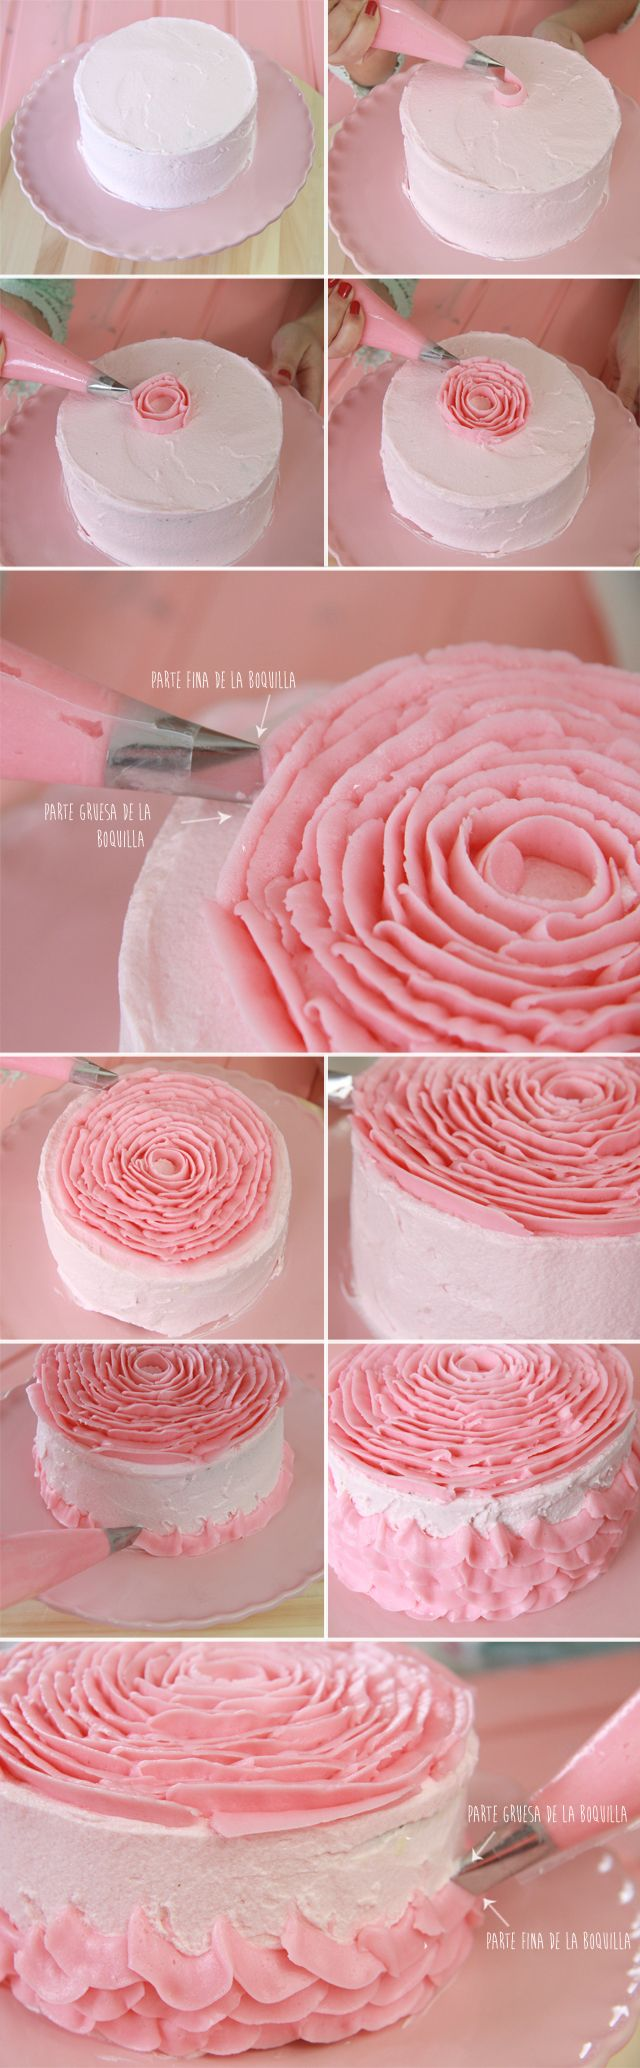 DIY Fabulous Rose Cake Decorating